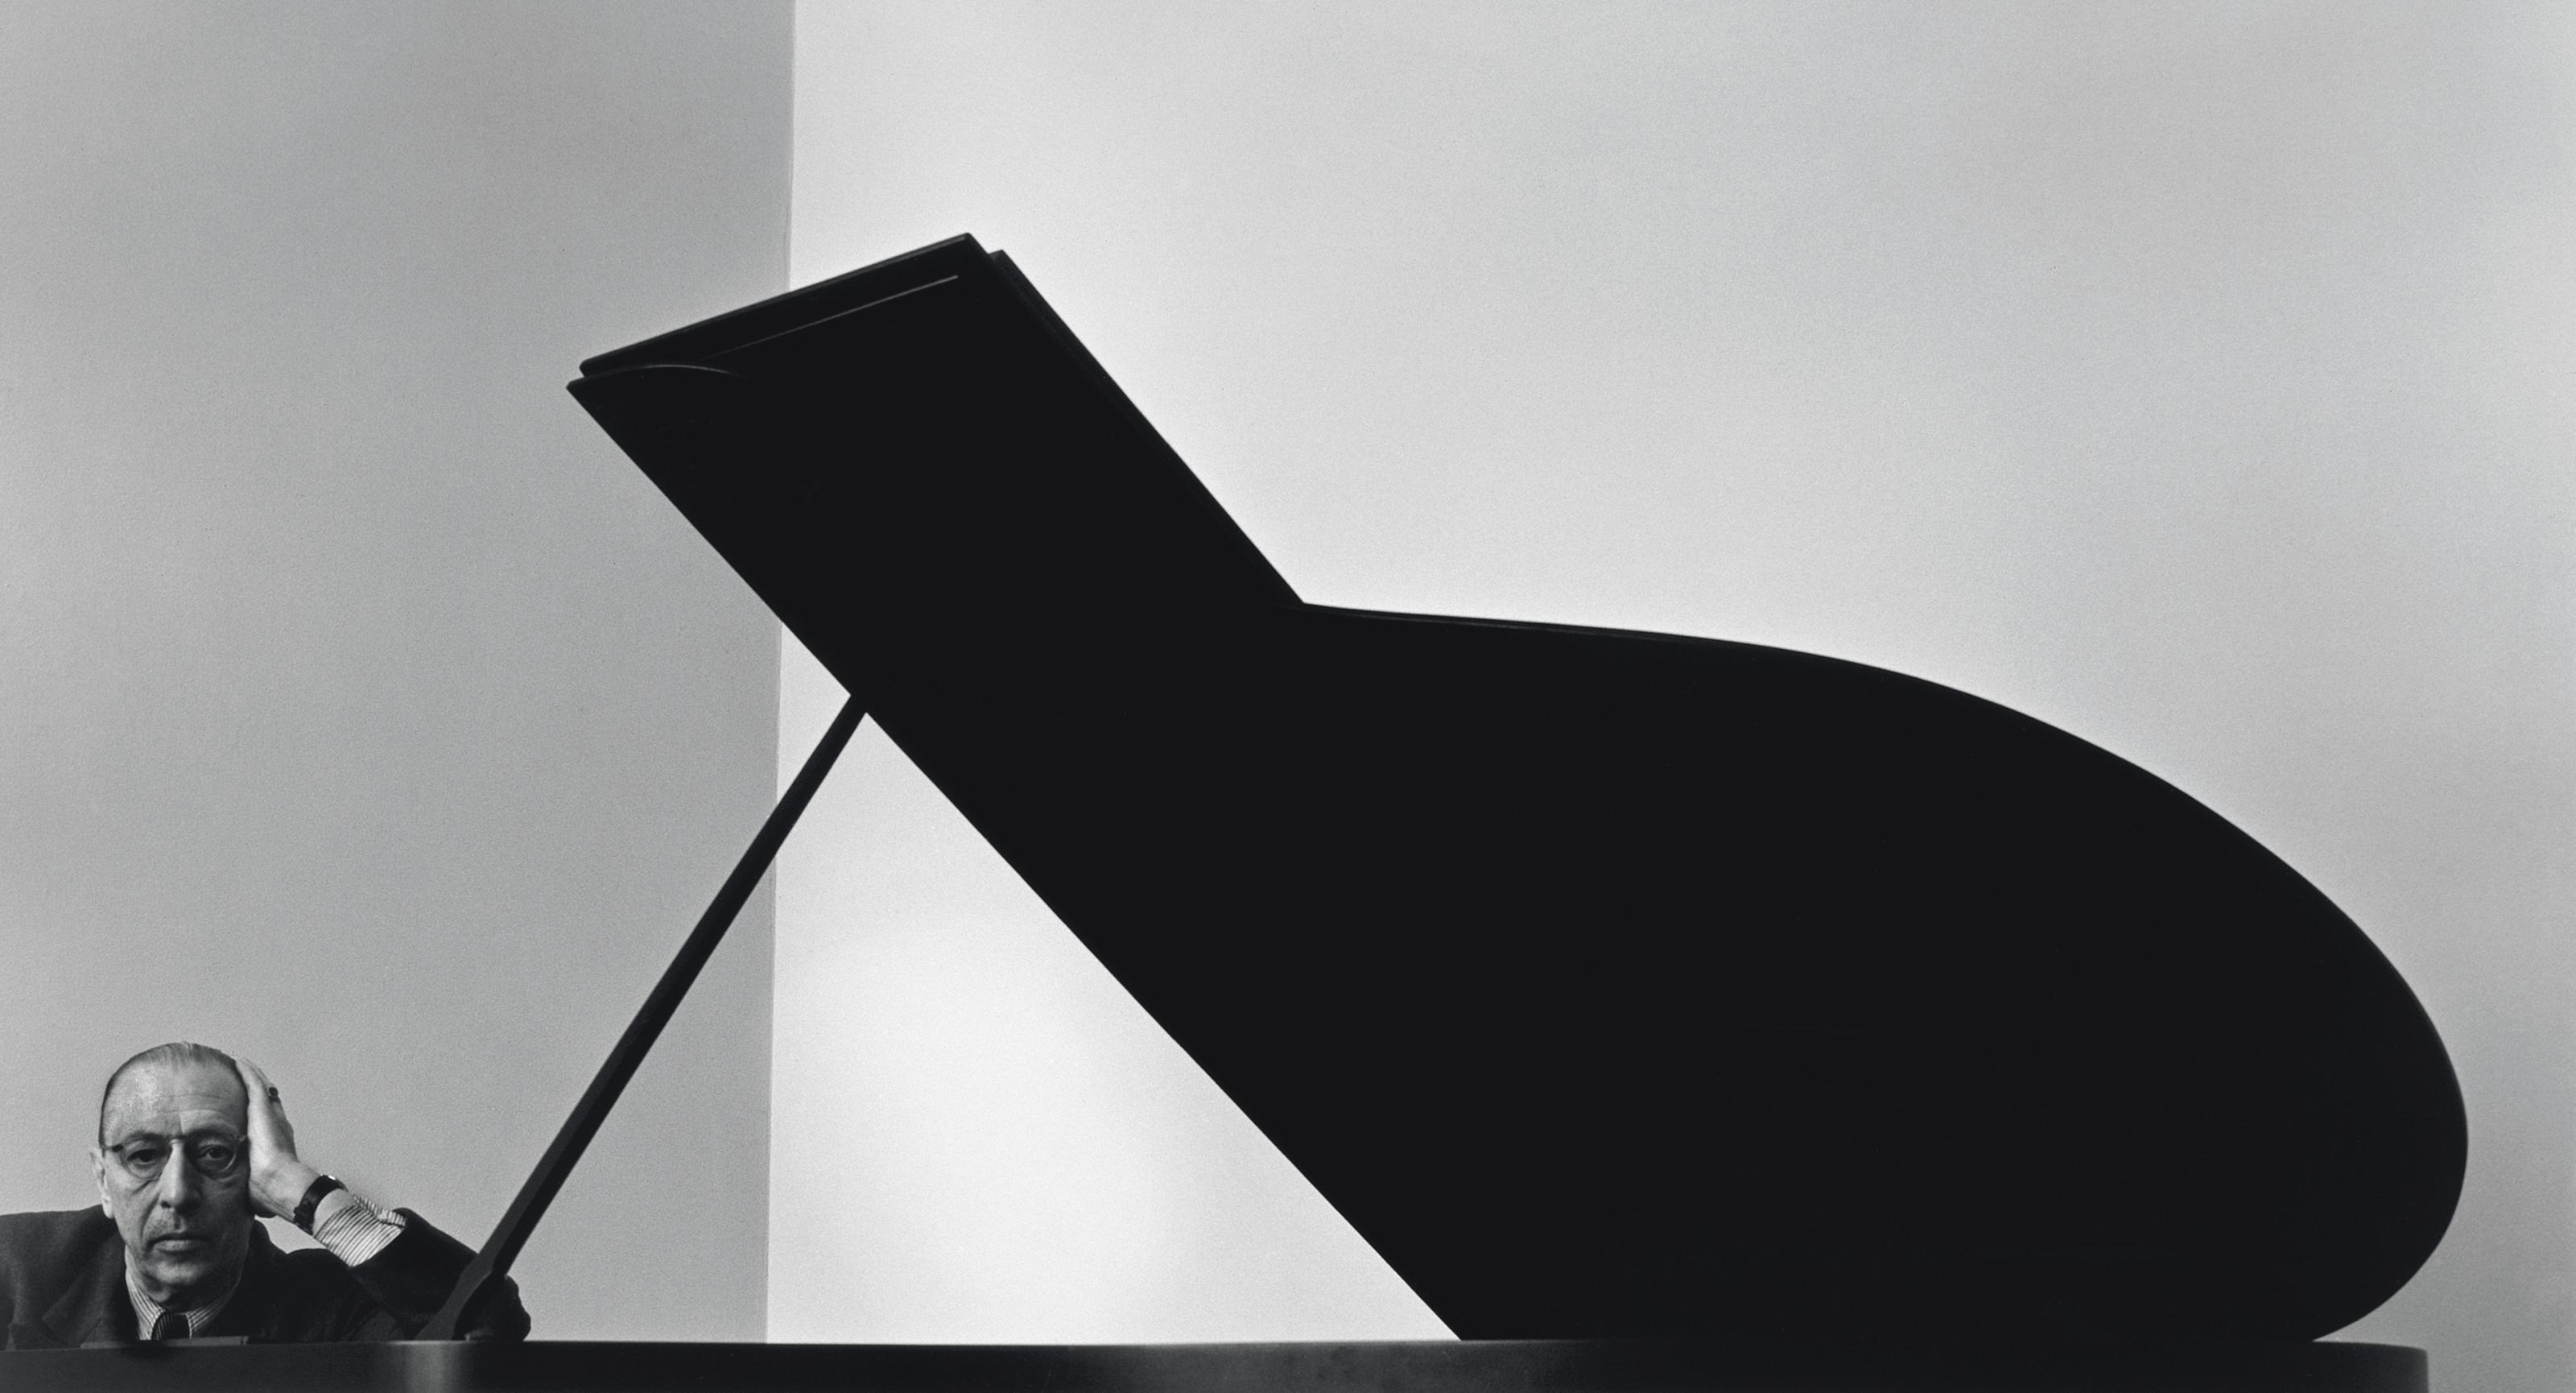 Igor Stravinsky, New York City, 1964